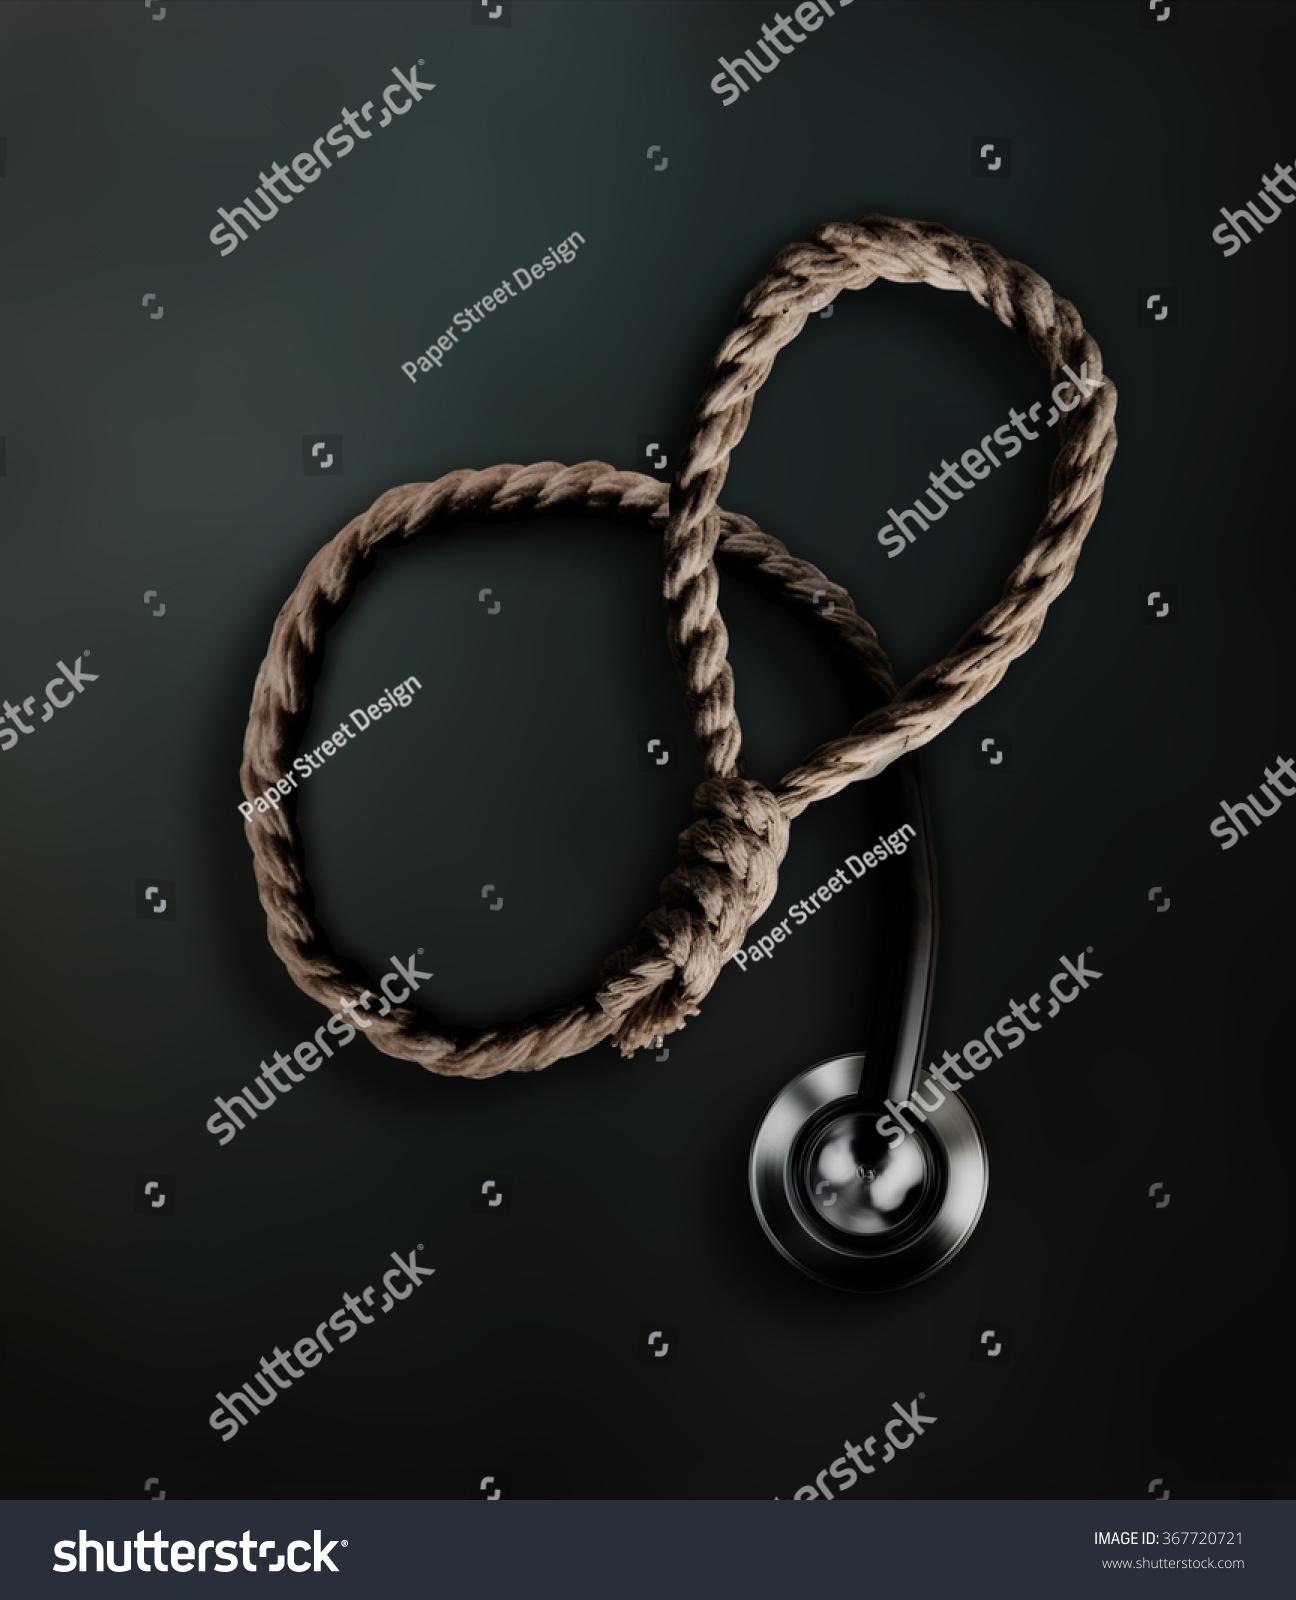 Hangmans Noose Transforming Into Doctors Stethoscope Stock